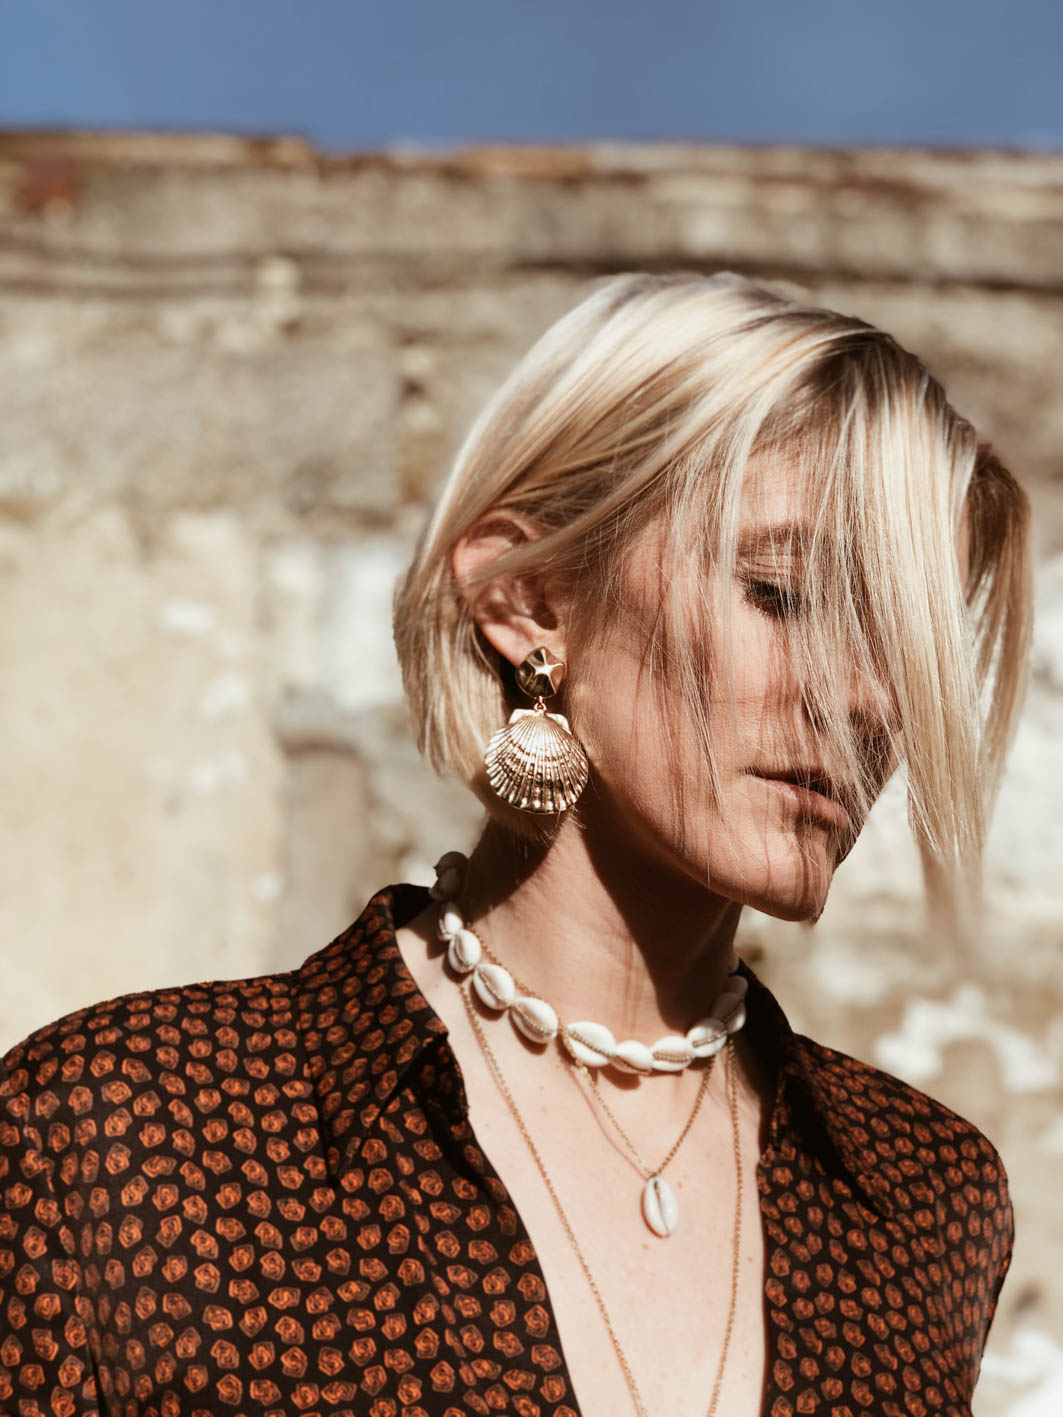 Carnet sauvage- blog mode et tendances - Bijoux coquillages14.jpg